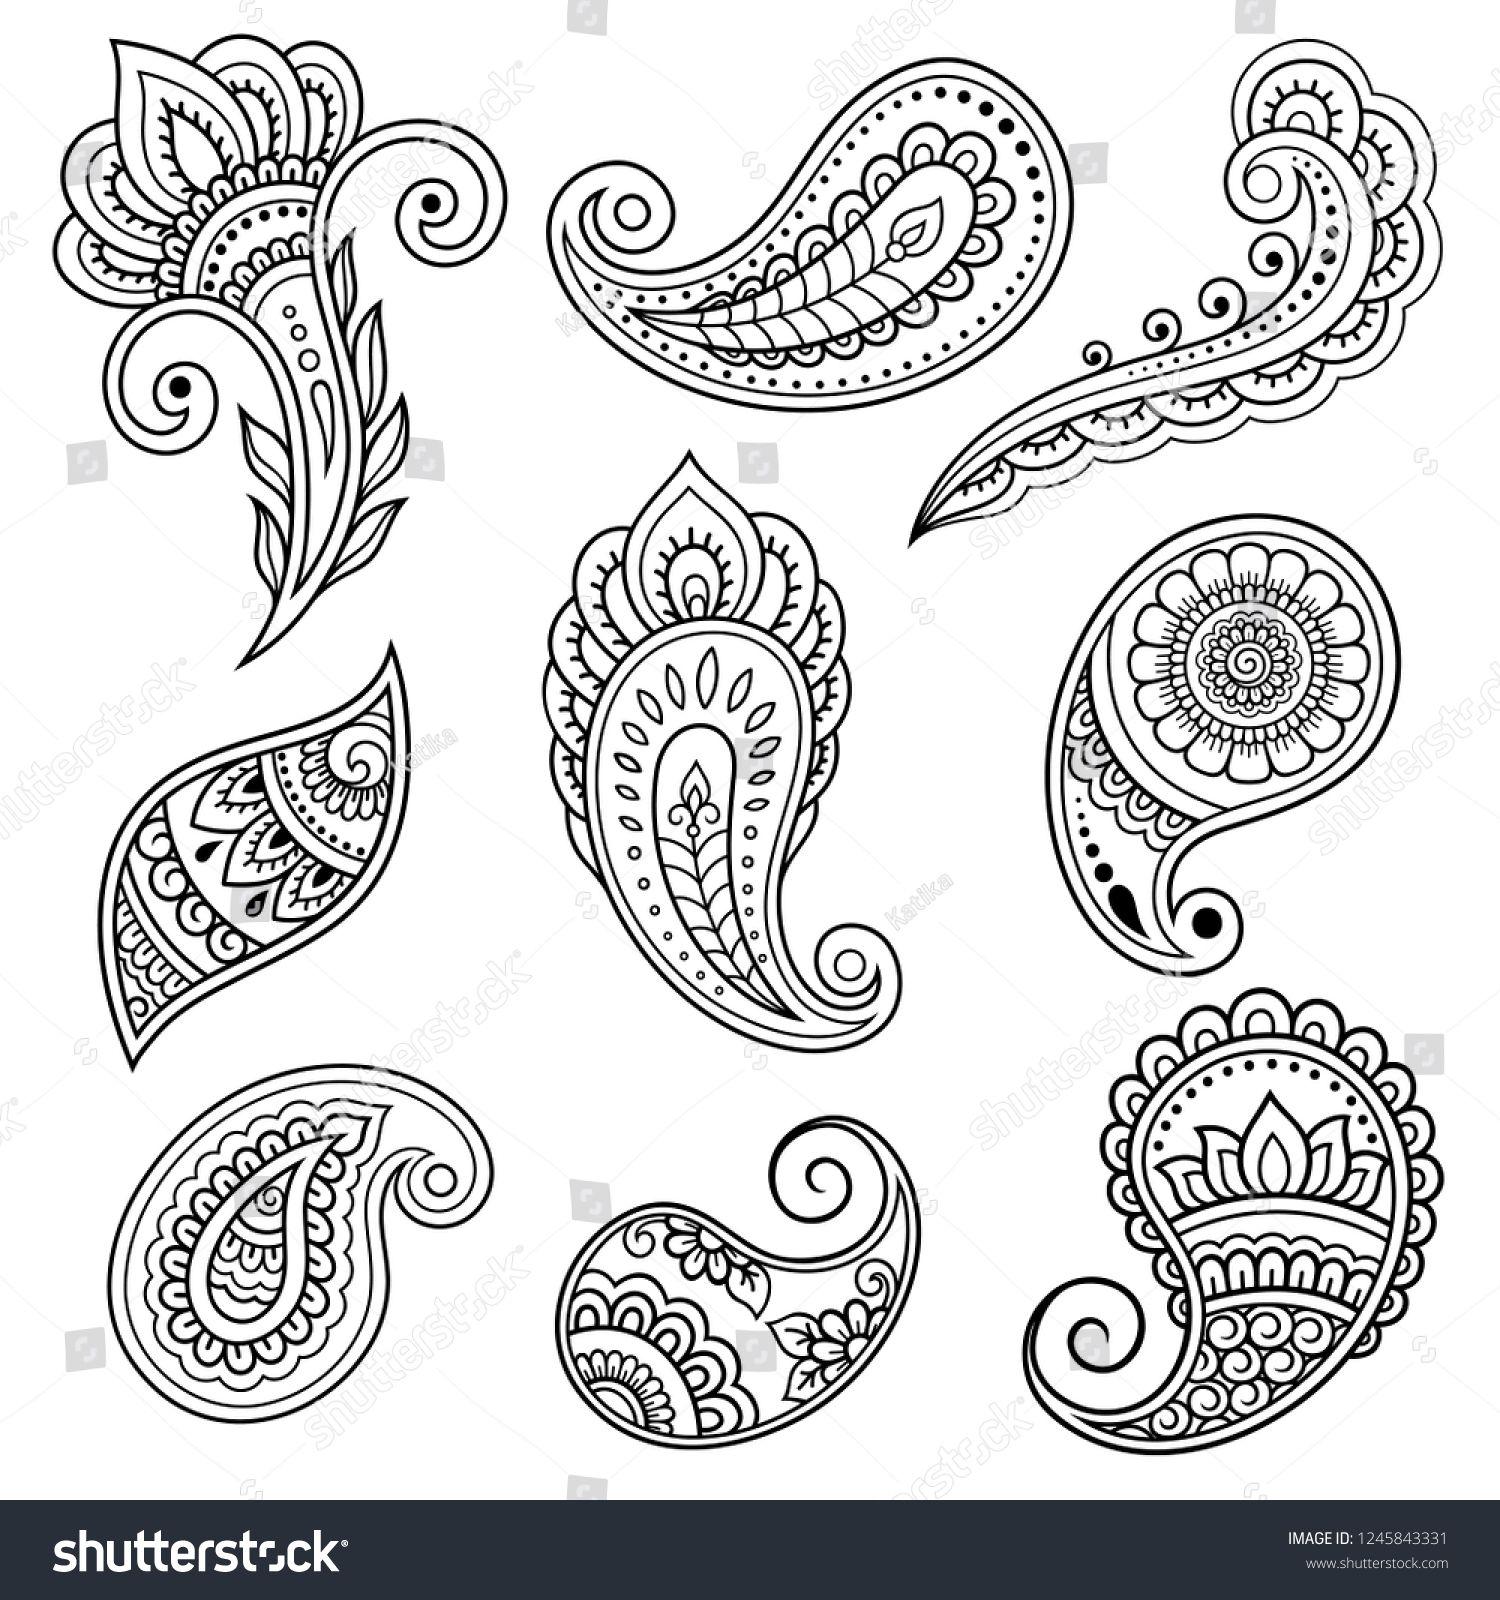 Set Mehndi Flower Pattern Henna Drawing Stock Vector (Royalty Free) 1245843331